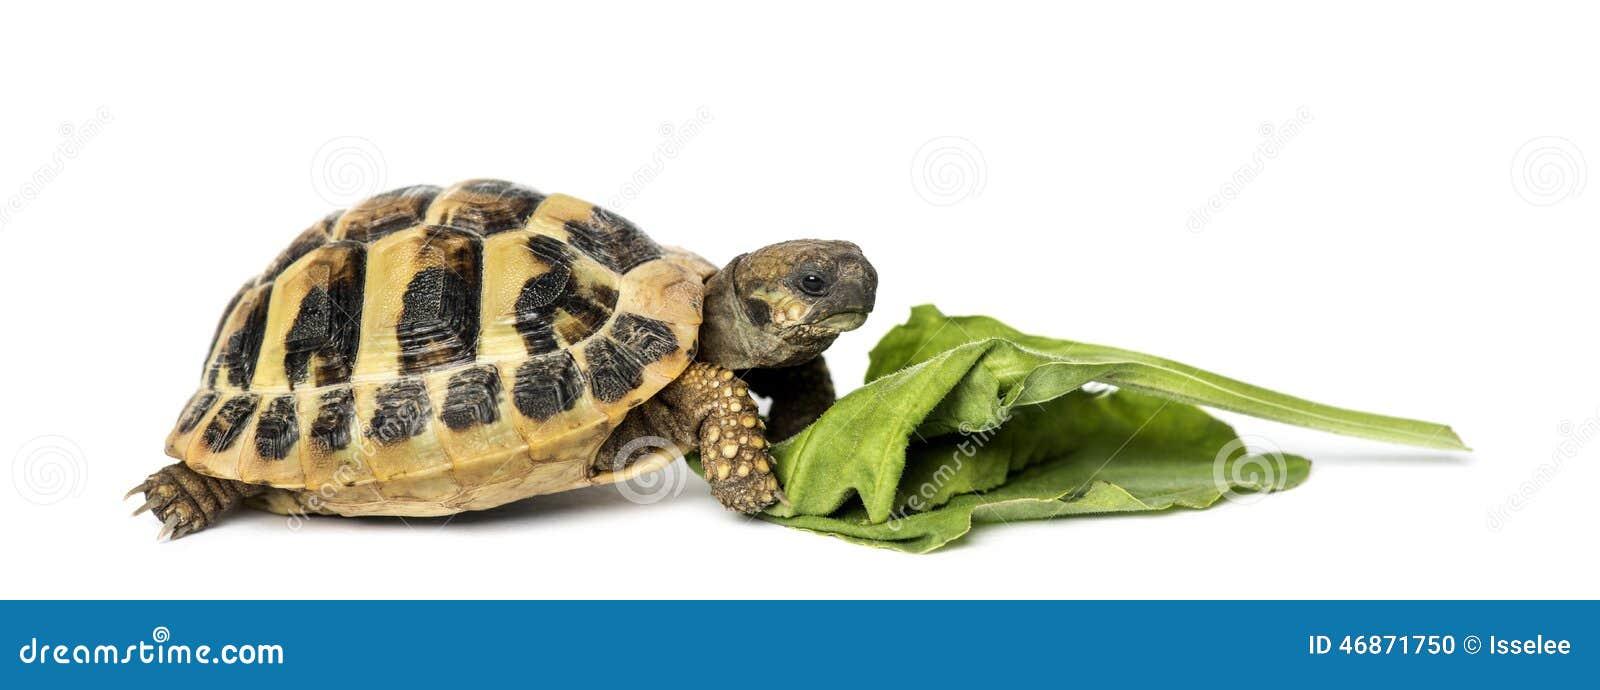 La tortuga de Hermann que come la ensalada, aislada